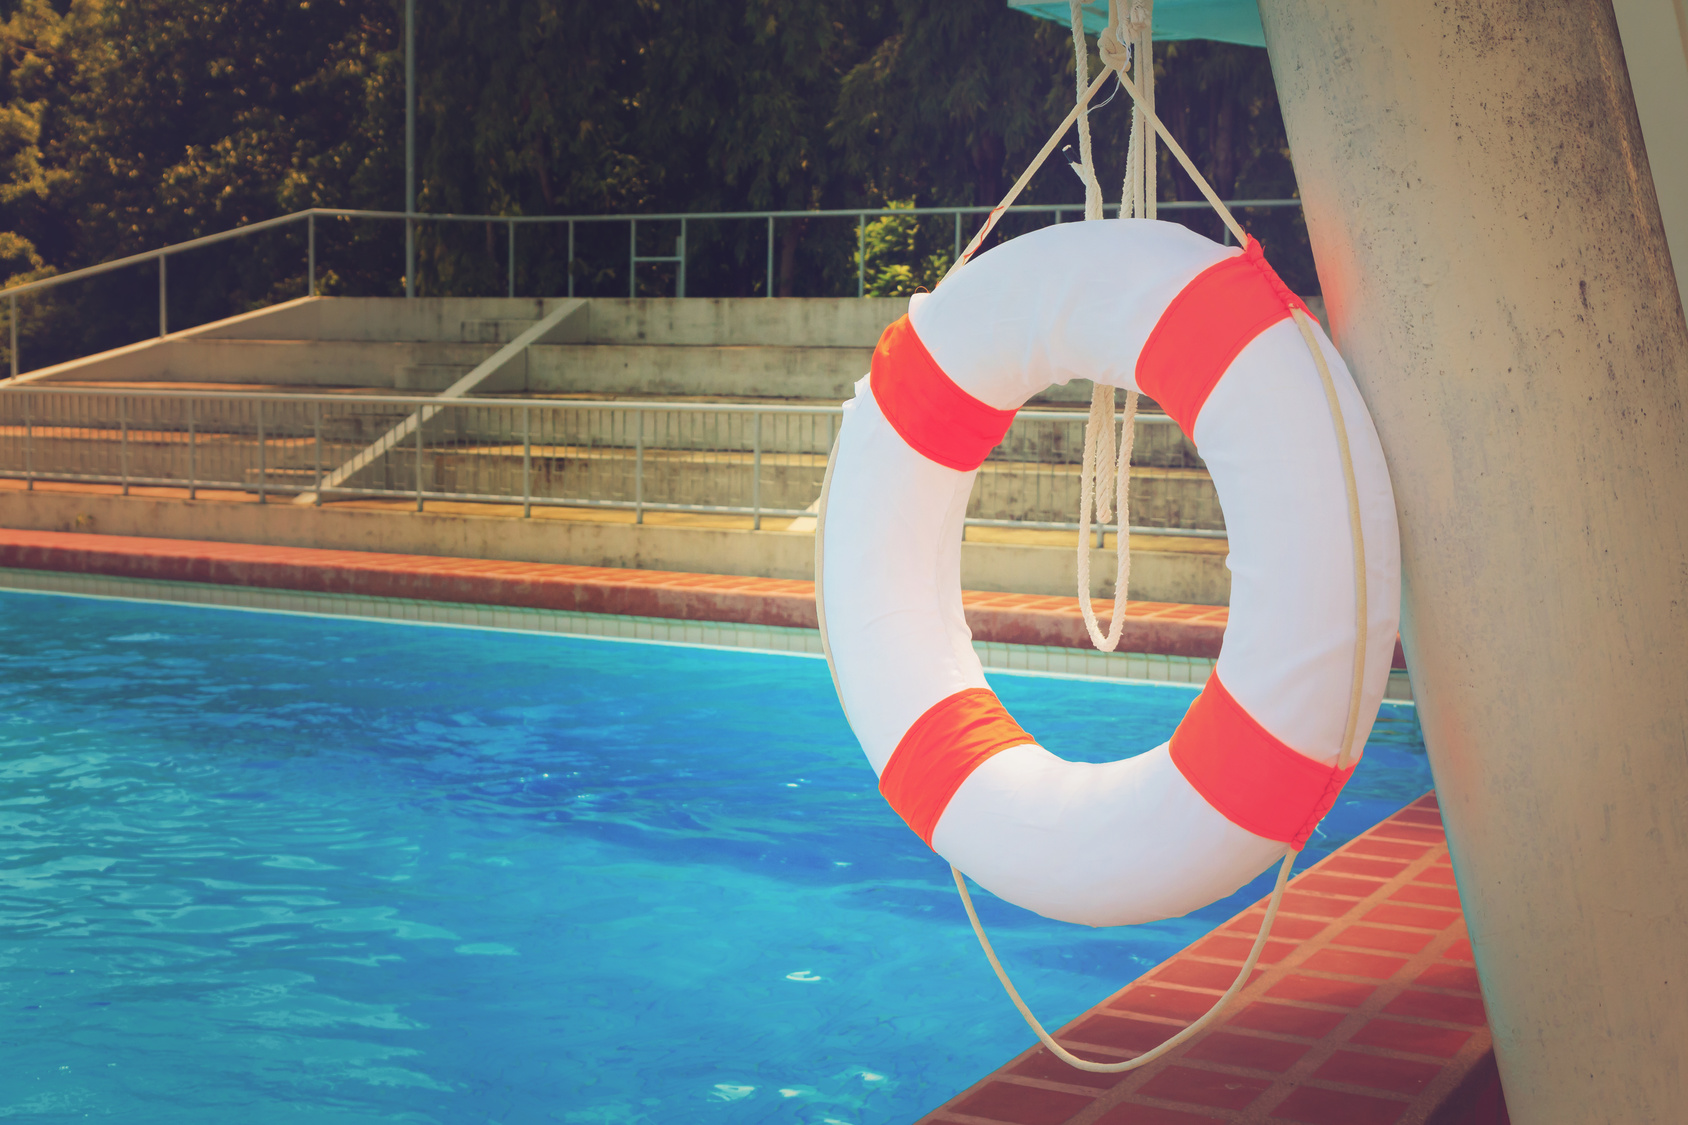 Mantenimiento de piscinas evitar fugas construcci n for Fugas de agua madrid